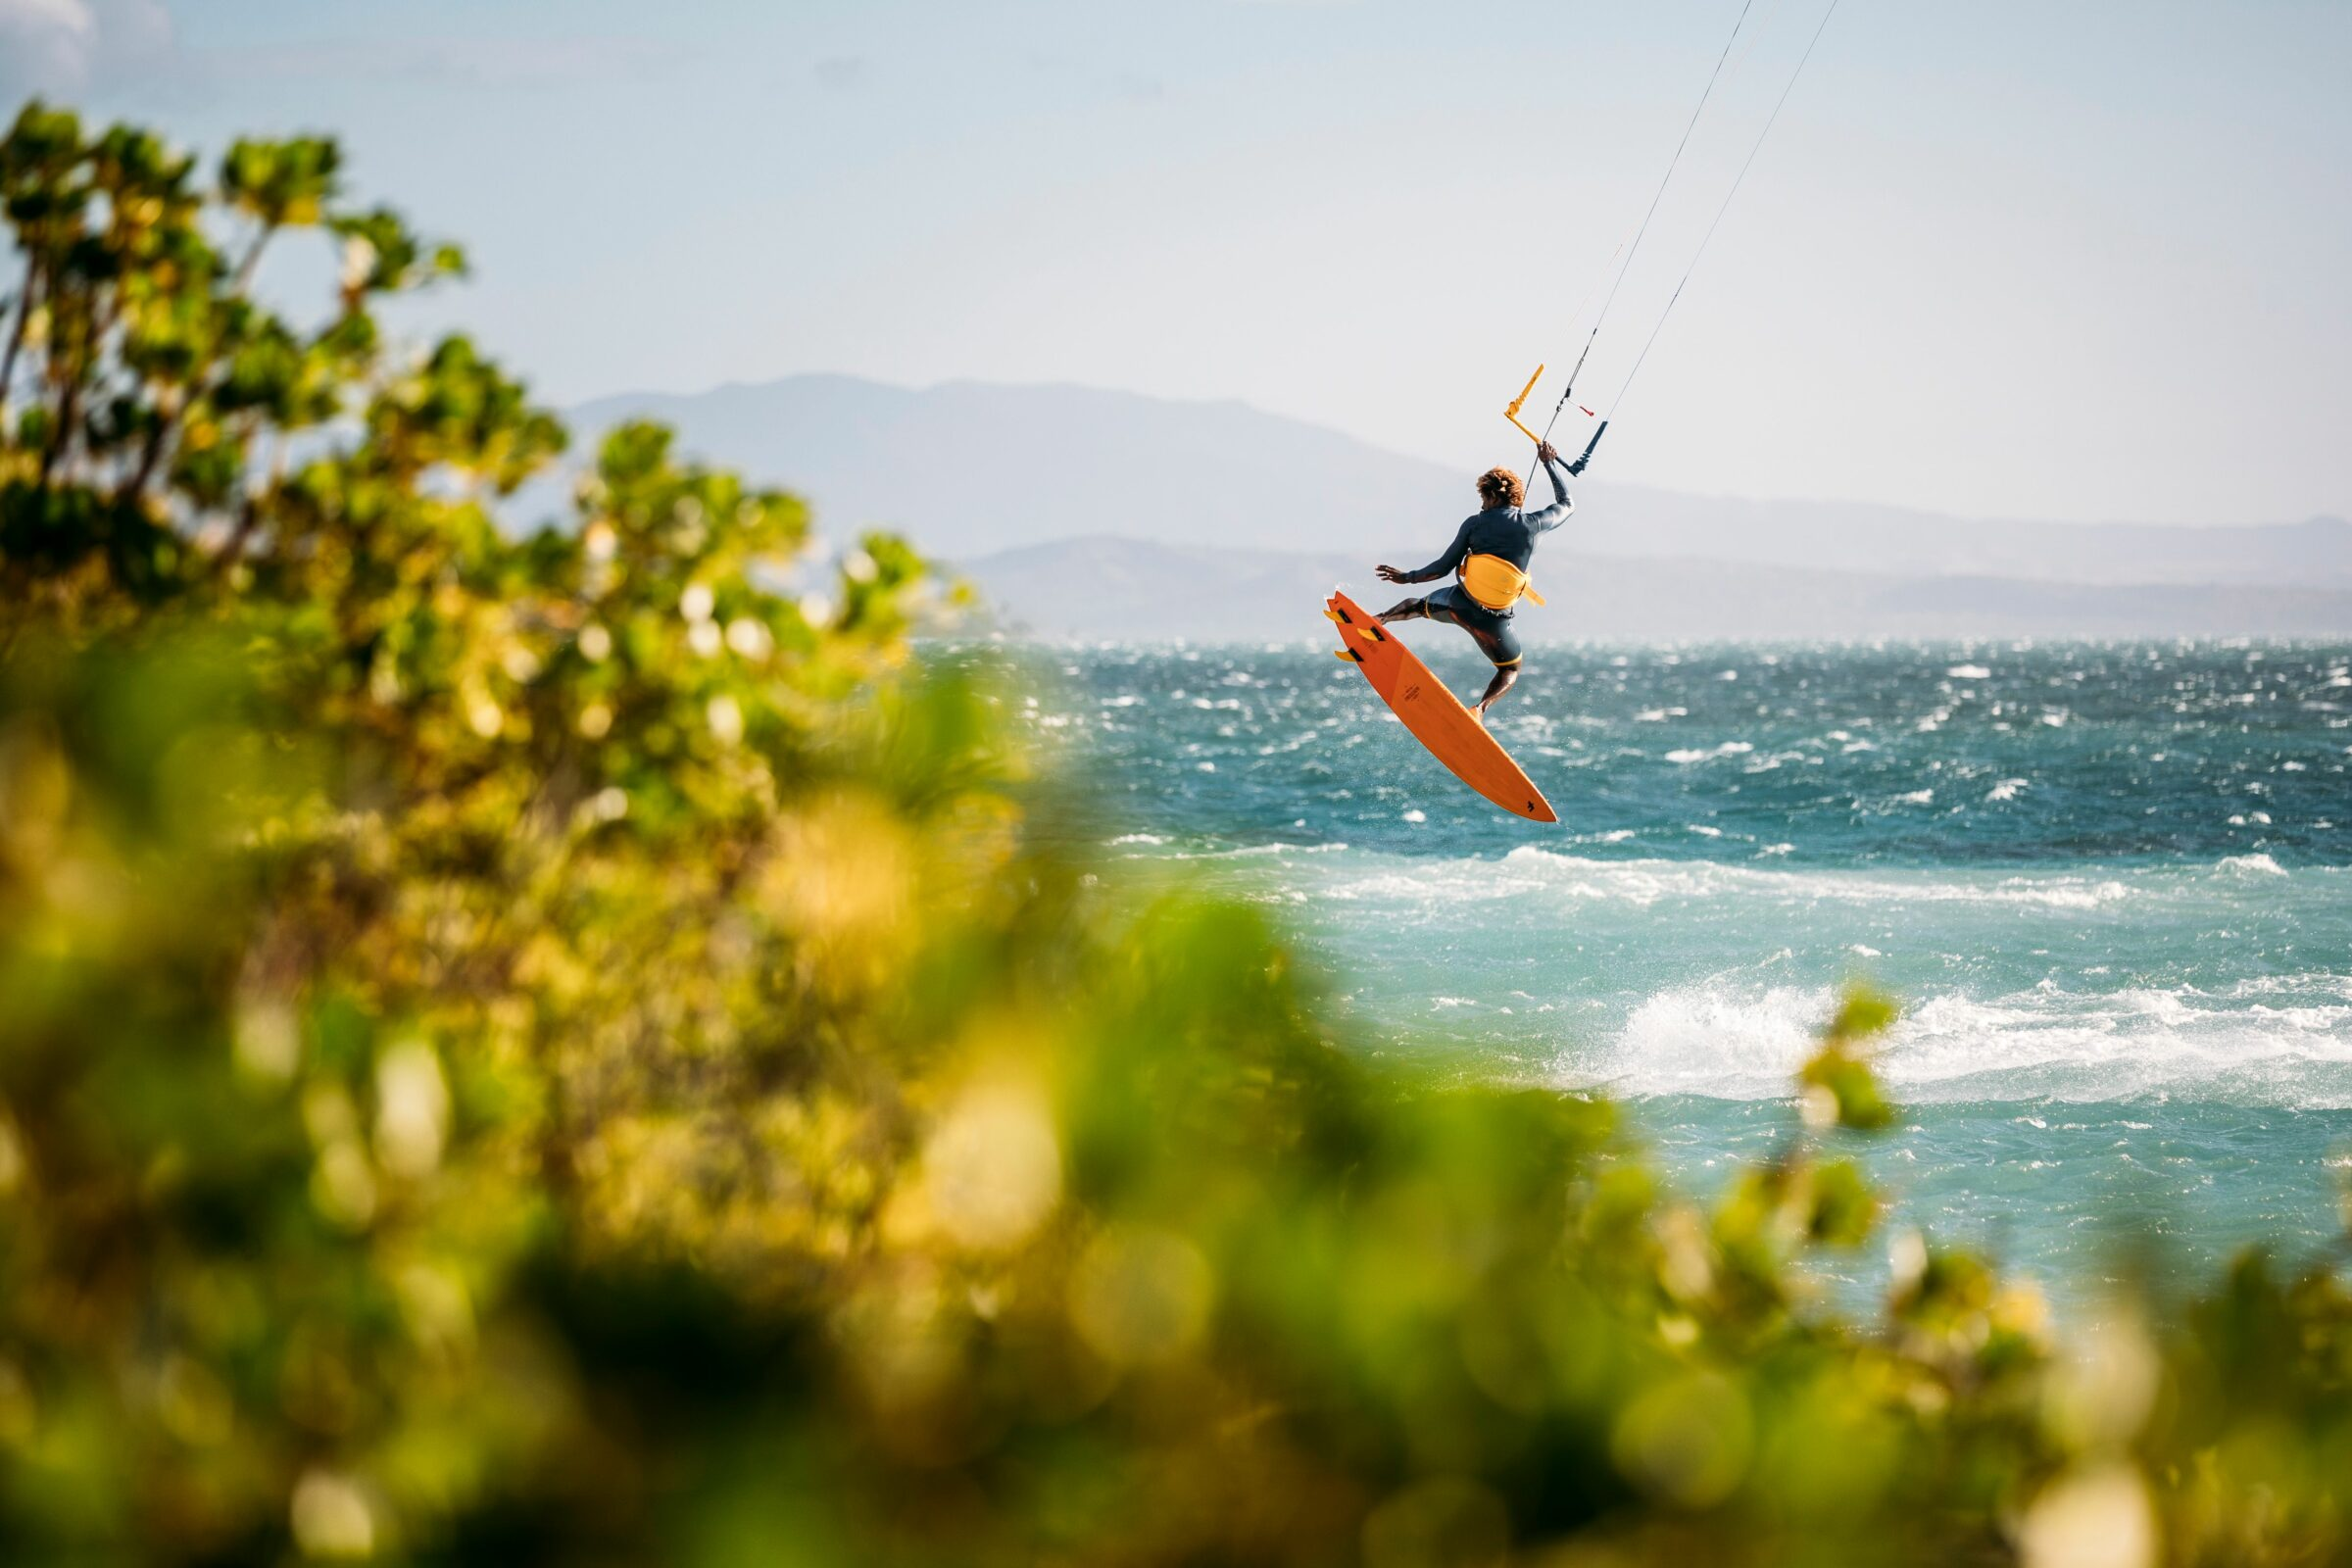 Access kiteboard magazine tot later op het water foto